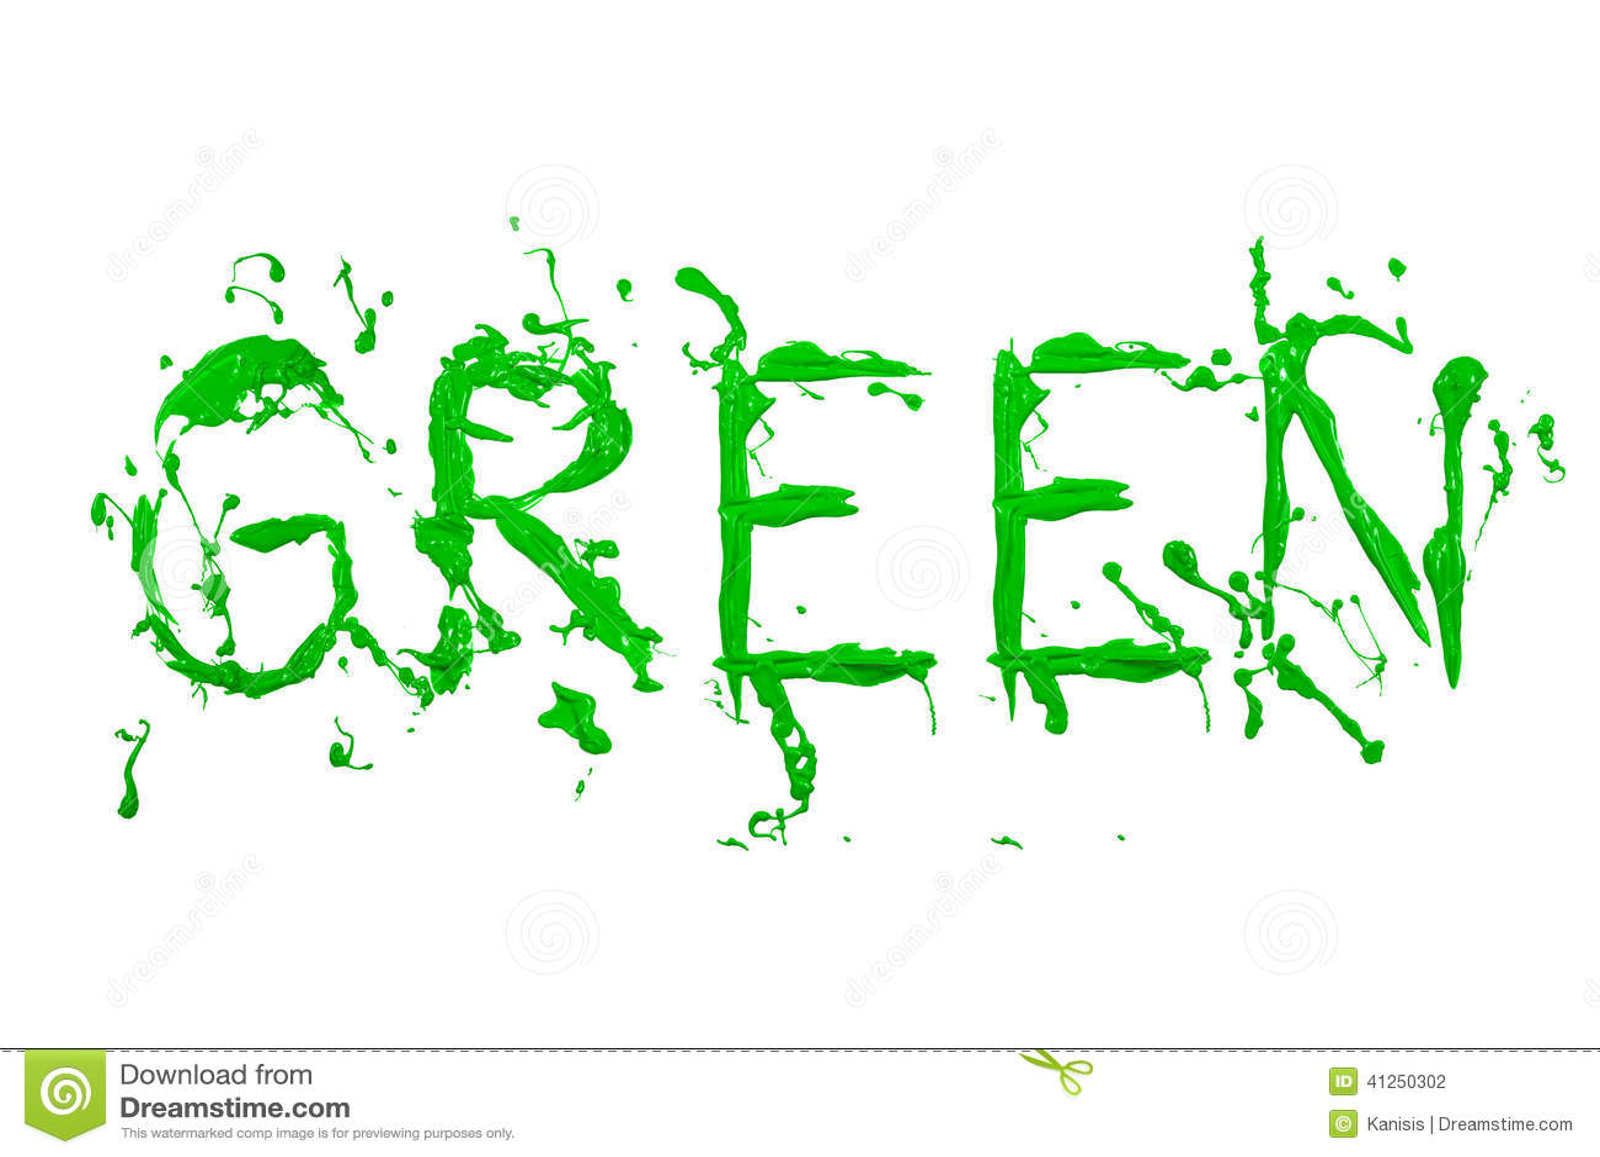 word green